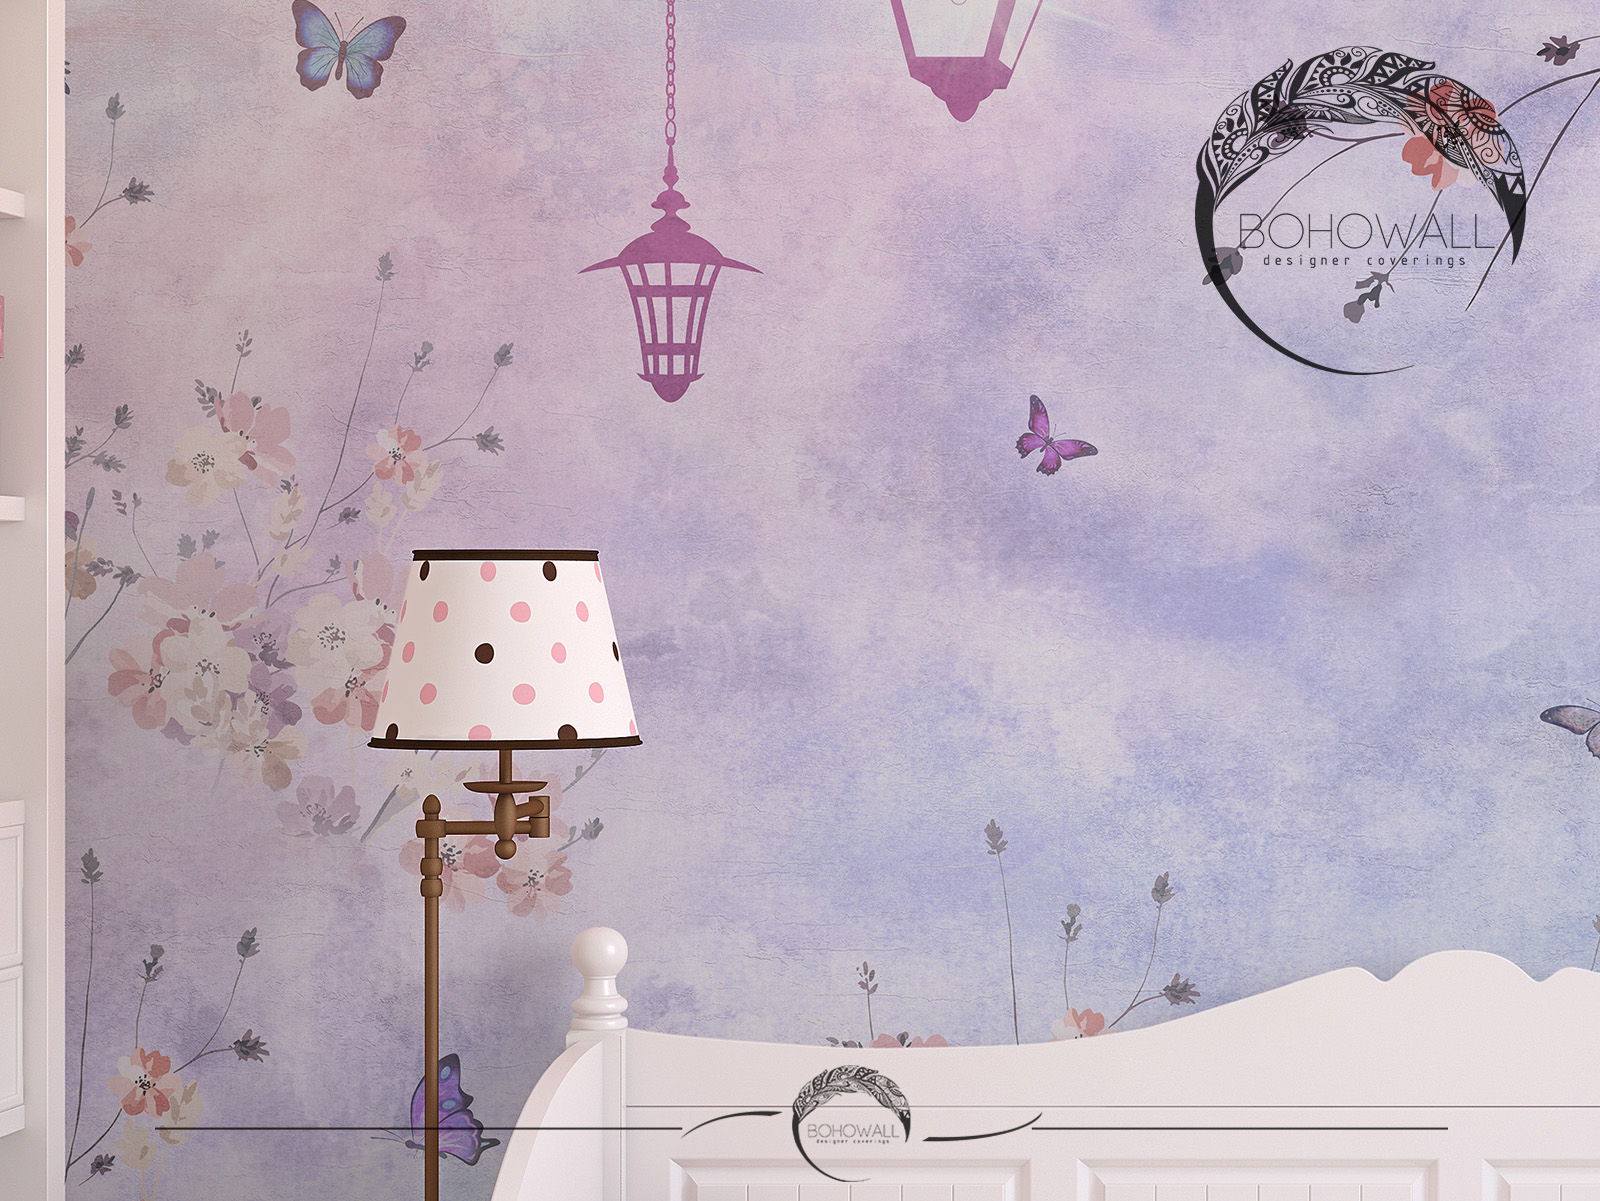 oboi_lantern-_bohowall_fr